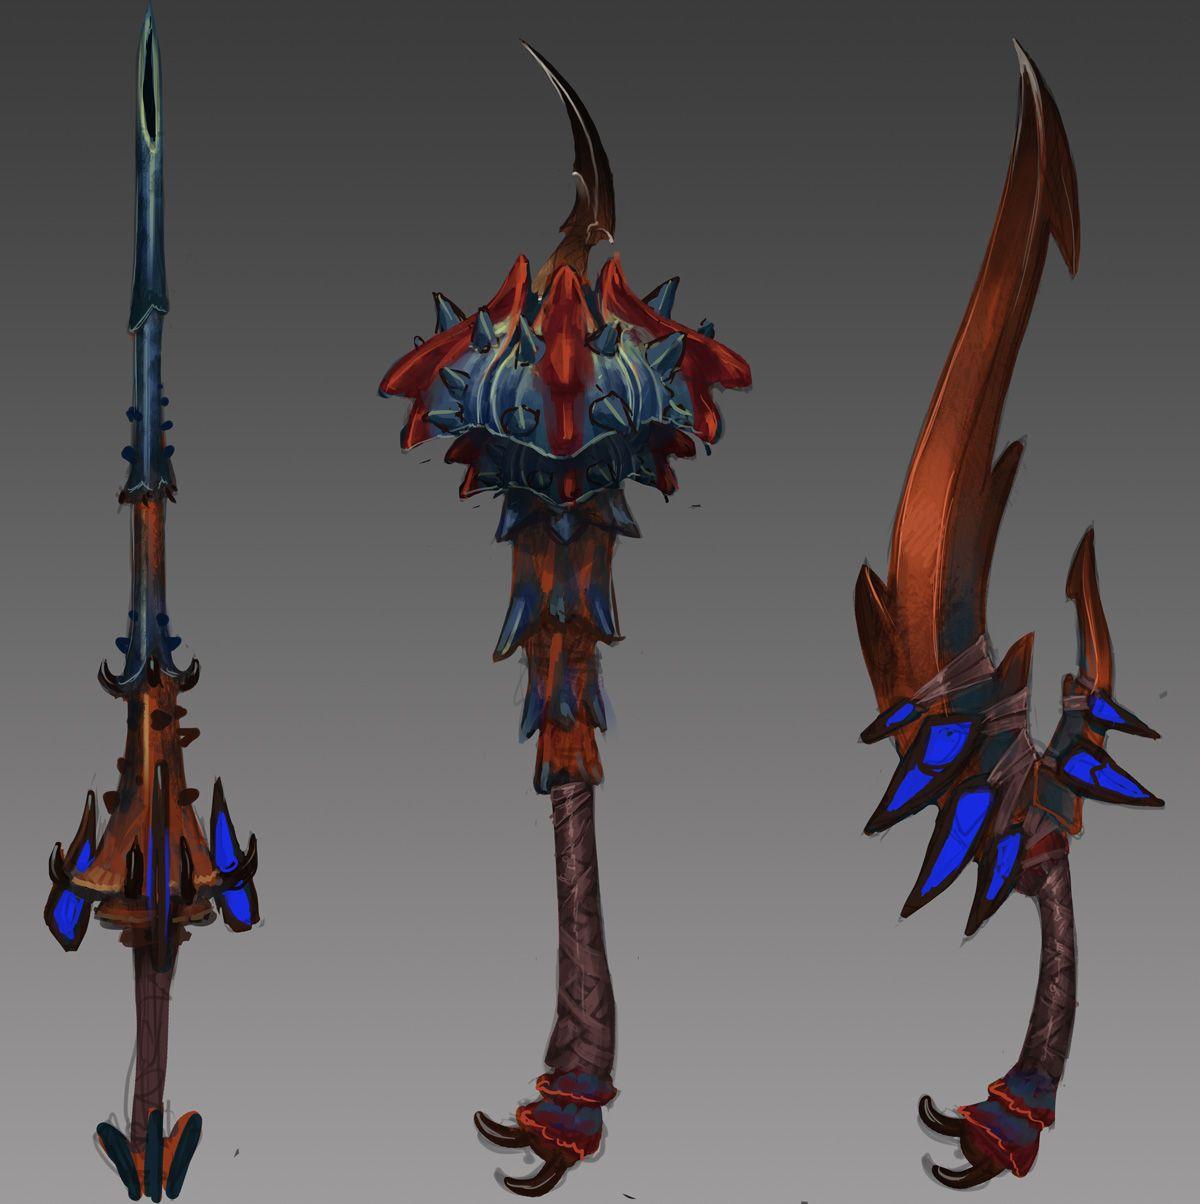 Gilded Rune Armor Runescape 2014 Imgurl